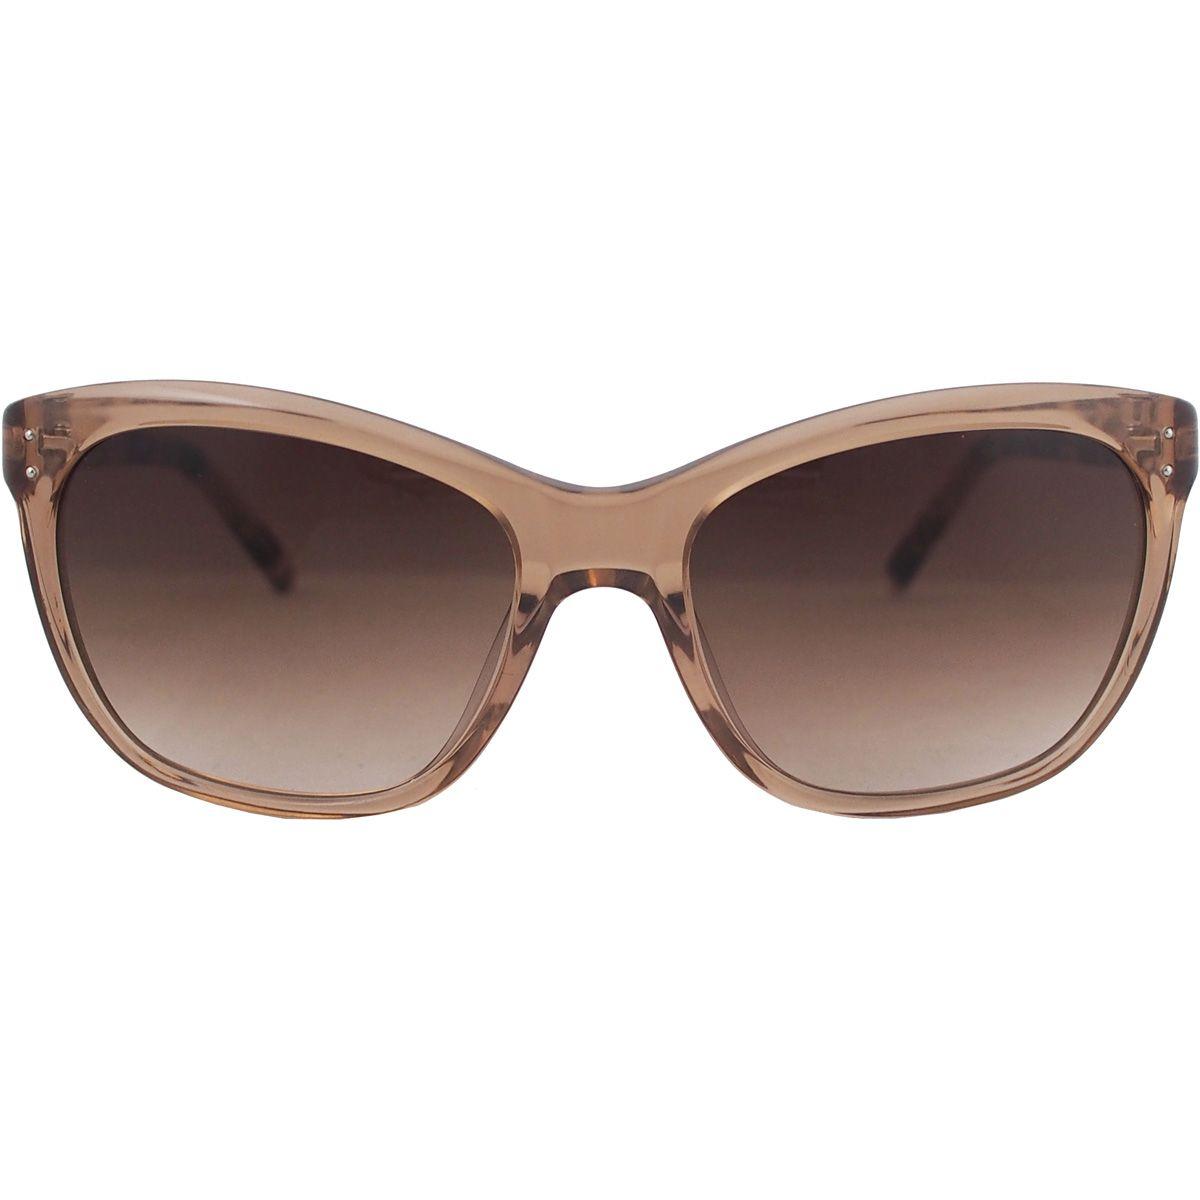 Flower Eyewear Sophie sunglasses in Blush/Pink Demi, $39; at Walmart ...